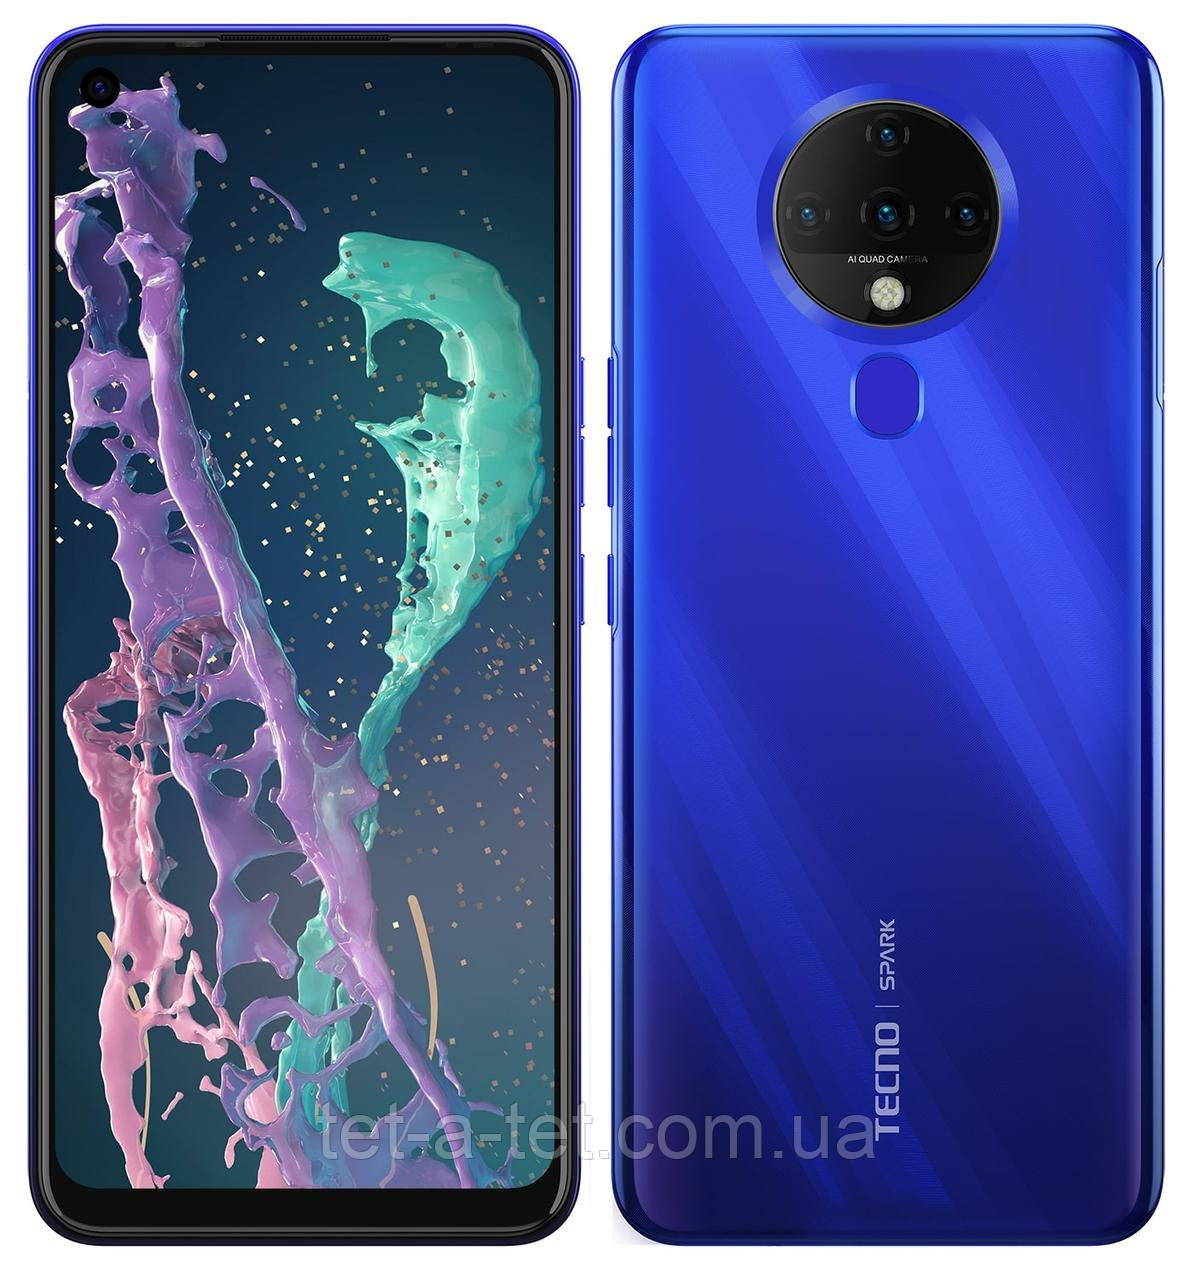 Смартфон TECNO Spark 6 (KE7) 4/128GB Ocean Blue (UA UCRF)